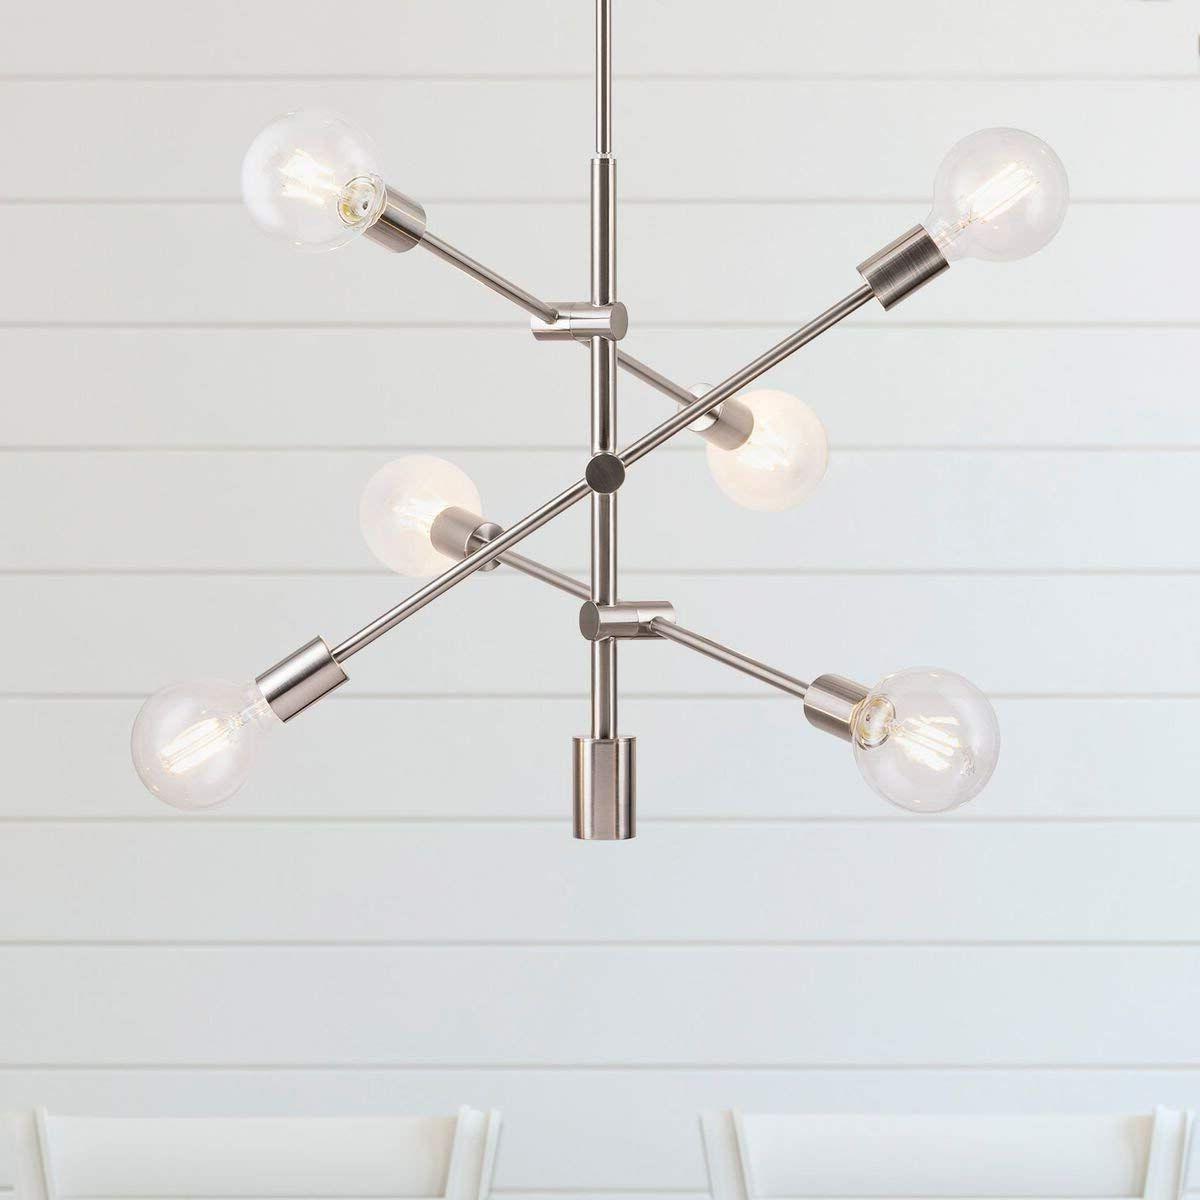 Newest Eladia 6 Light Sputnik Chandeliers For Marabella Led Sputnik Chandelier Light Fixture, Brushed (Gallery 17 of 20)